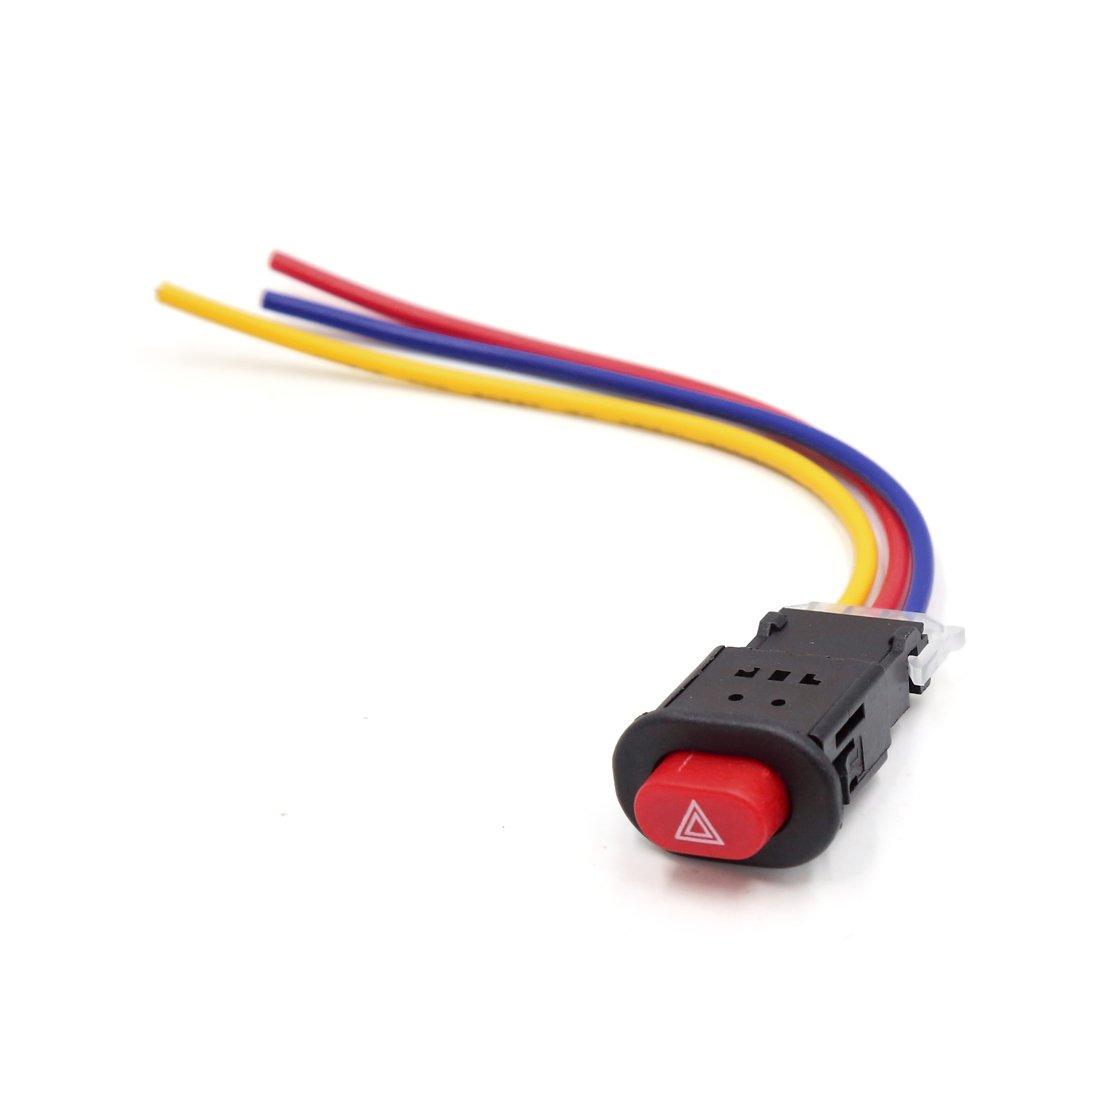 sourcing map 3 con Conexión de Cable Rojo Accesorio de Motocicleta Scooter de Pulsador Doble Flash Interruptor de Advertencia 12V 24V